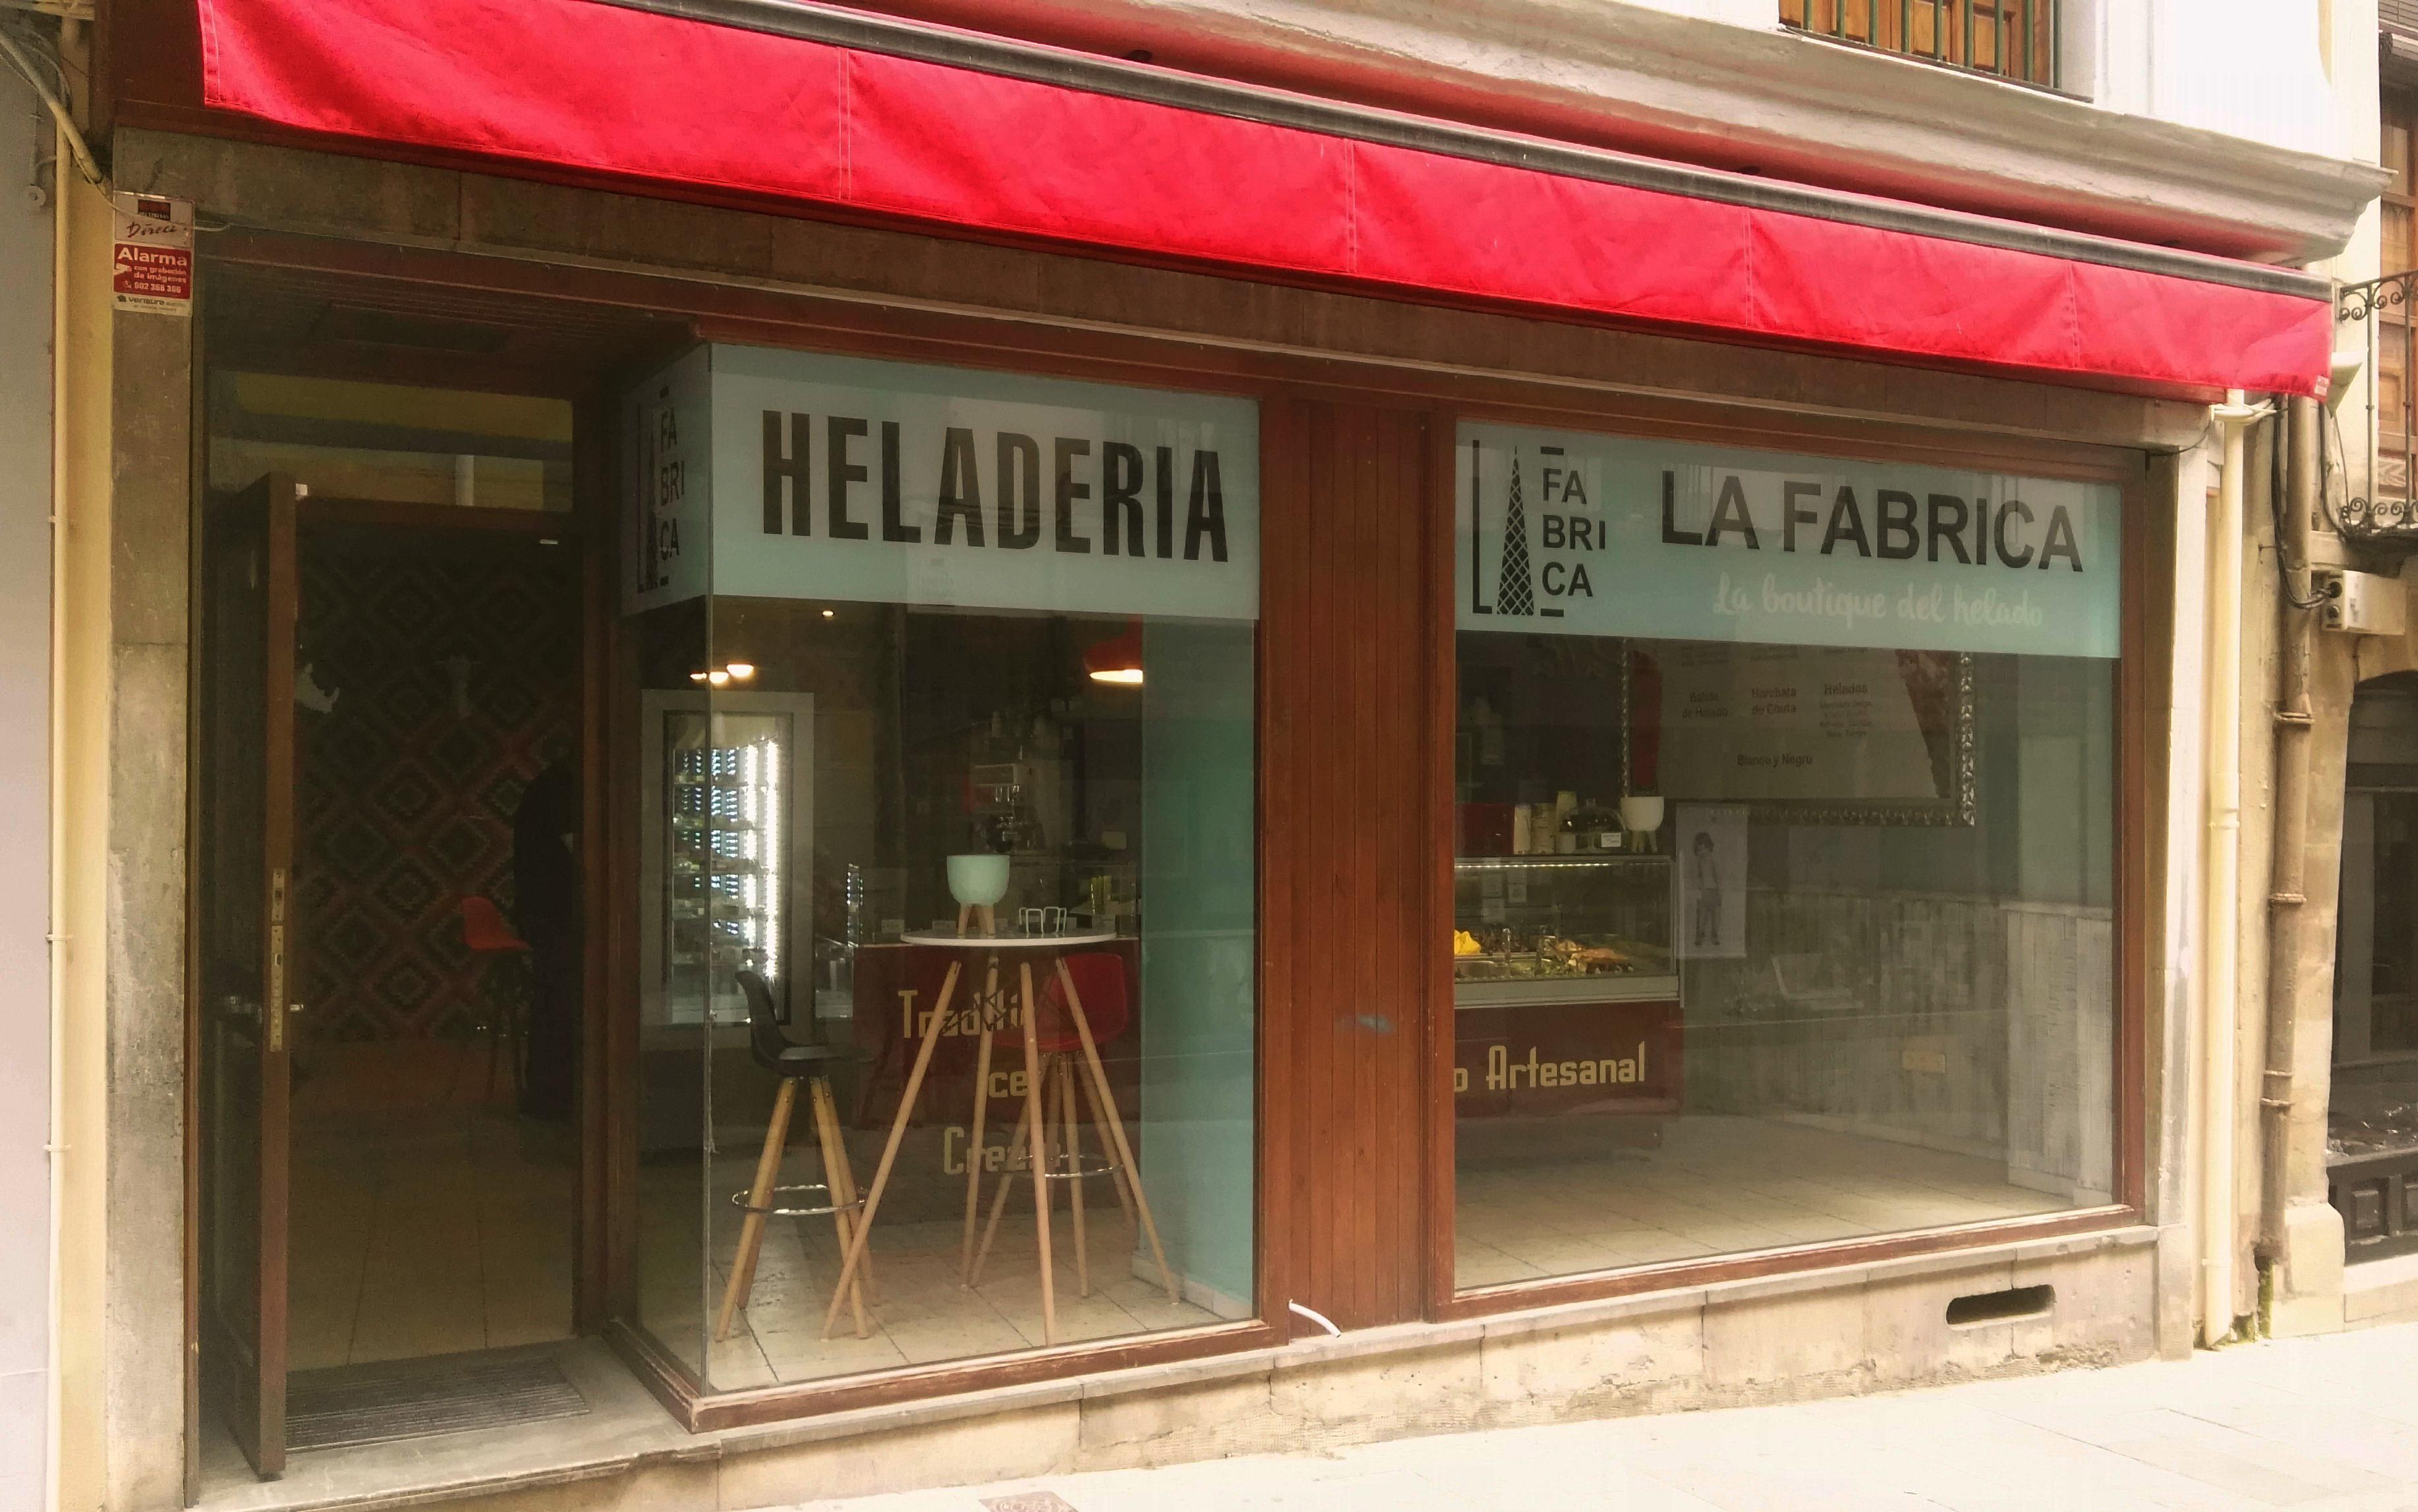 Heladeria La Fabrica